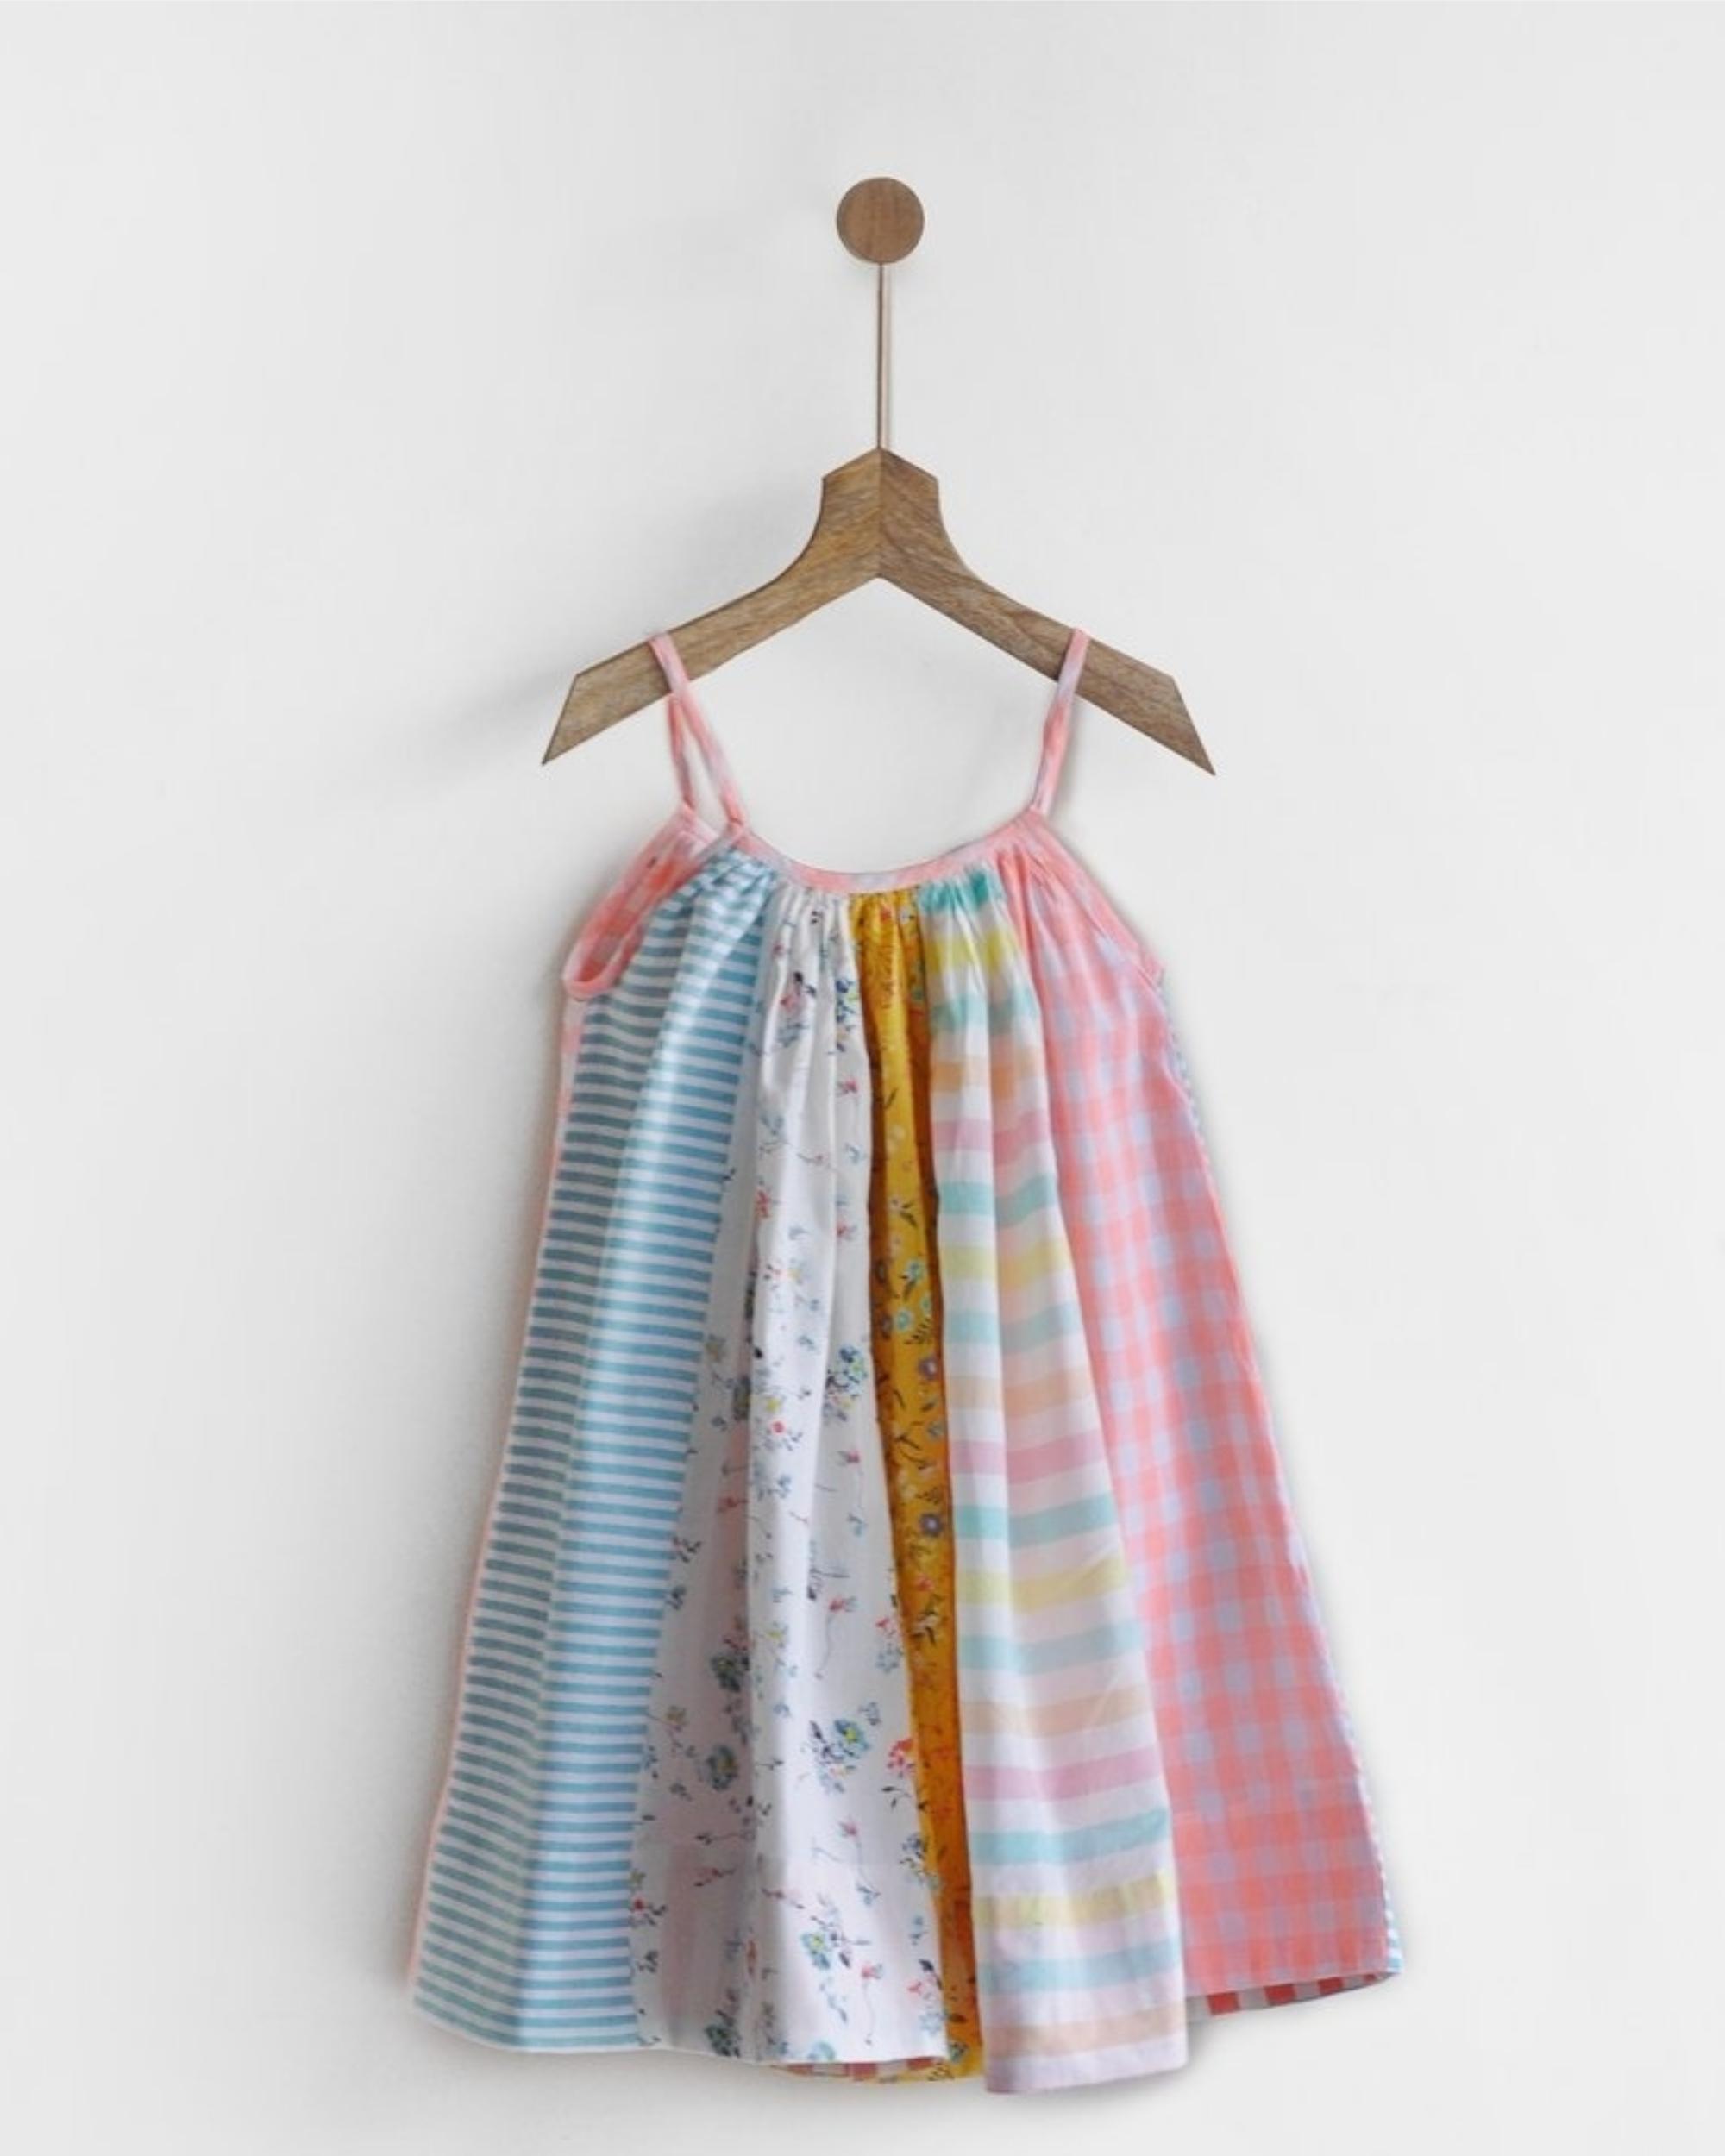 Paneled circle dress